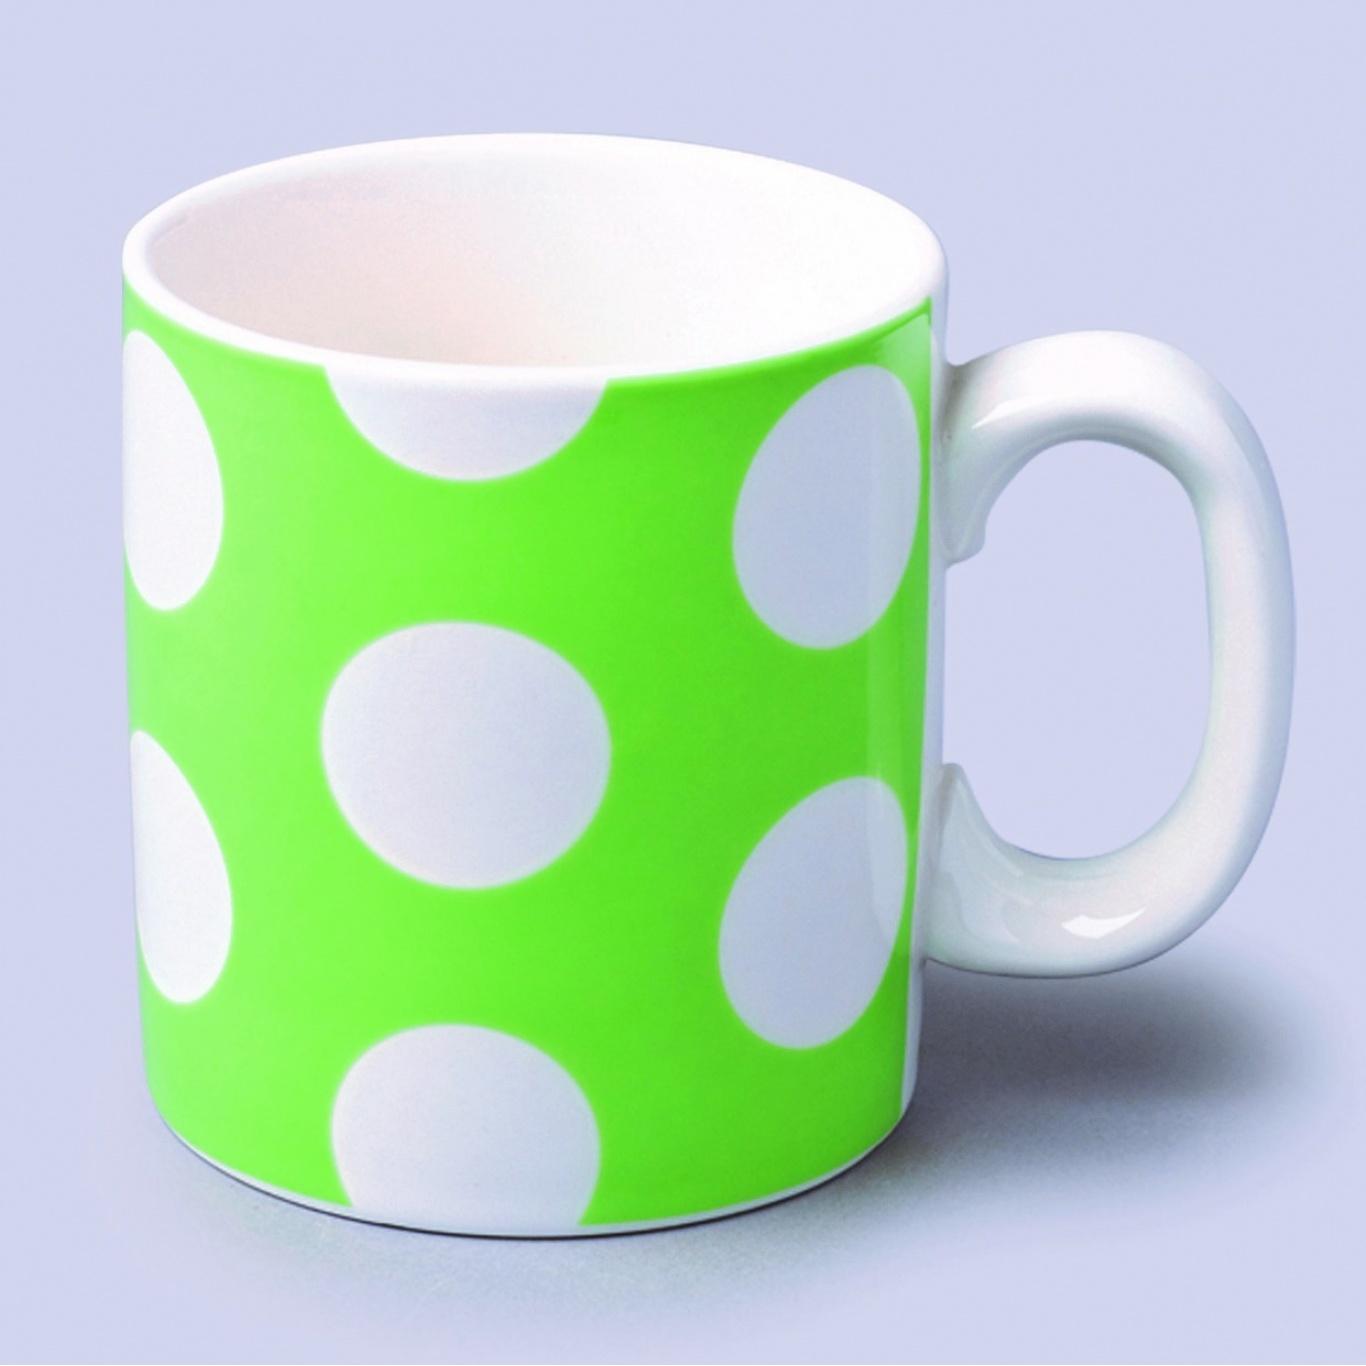 Image of Large Mug Green Spot 0.7 pint